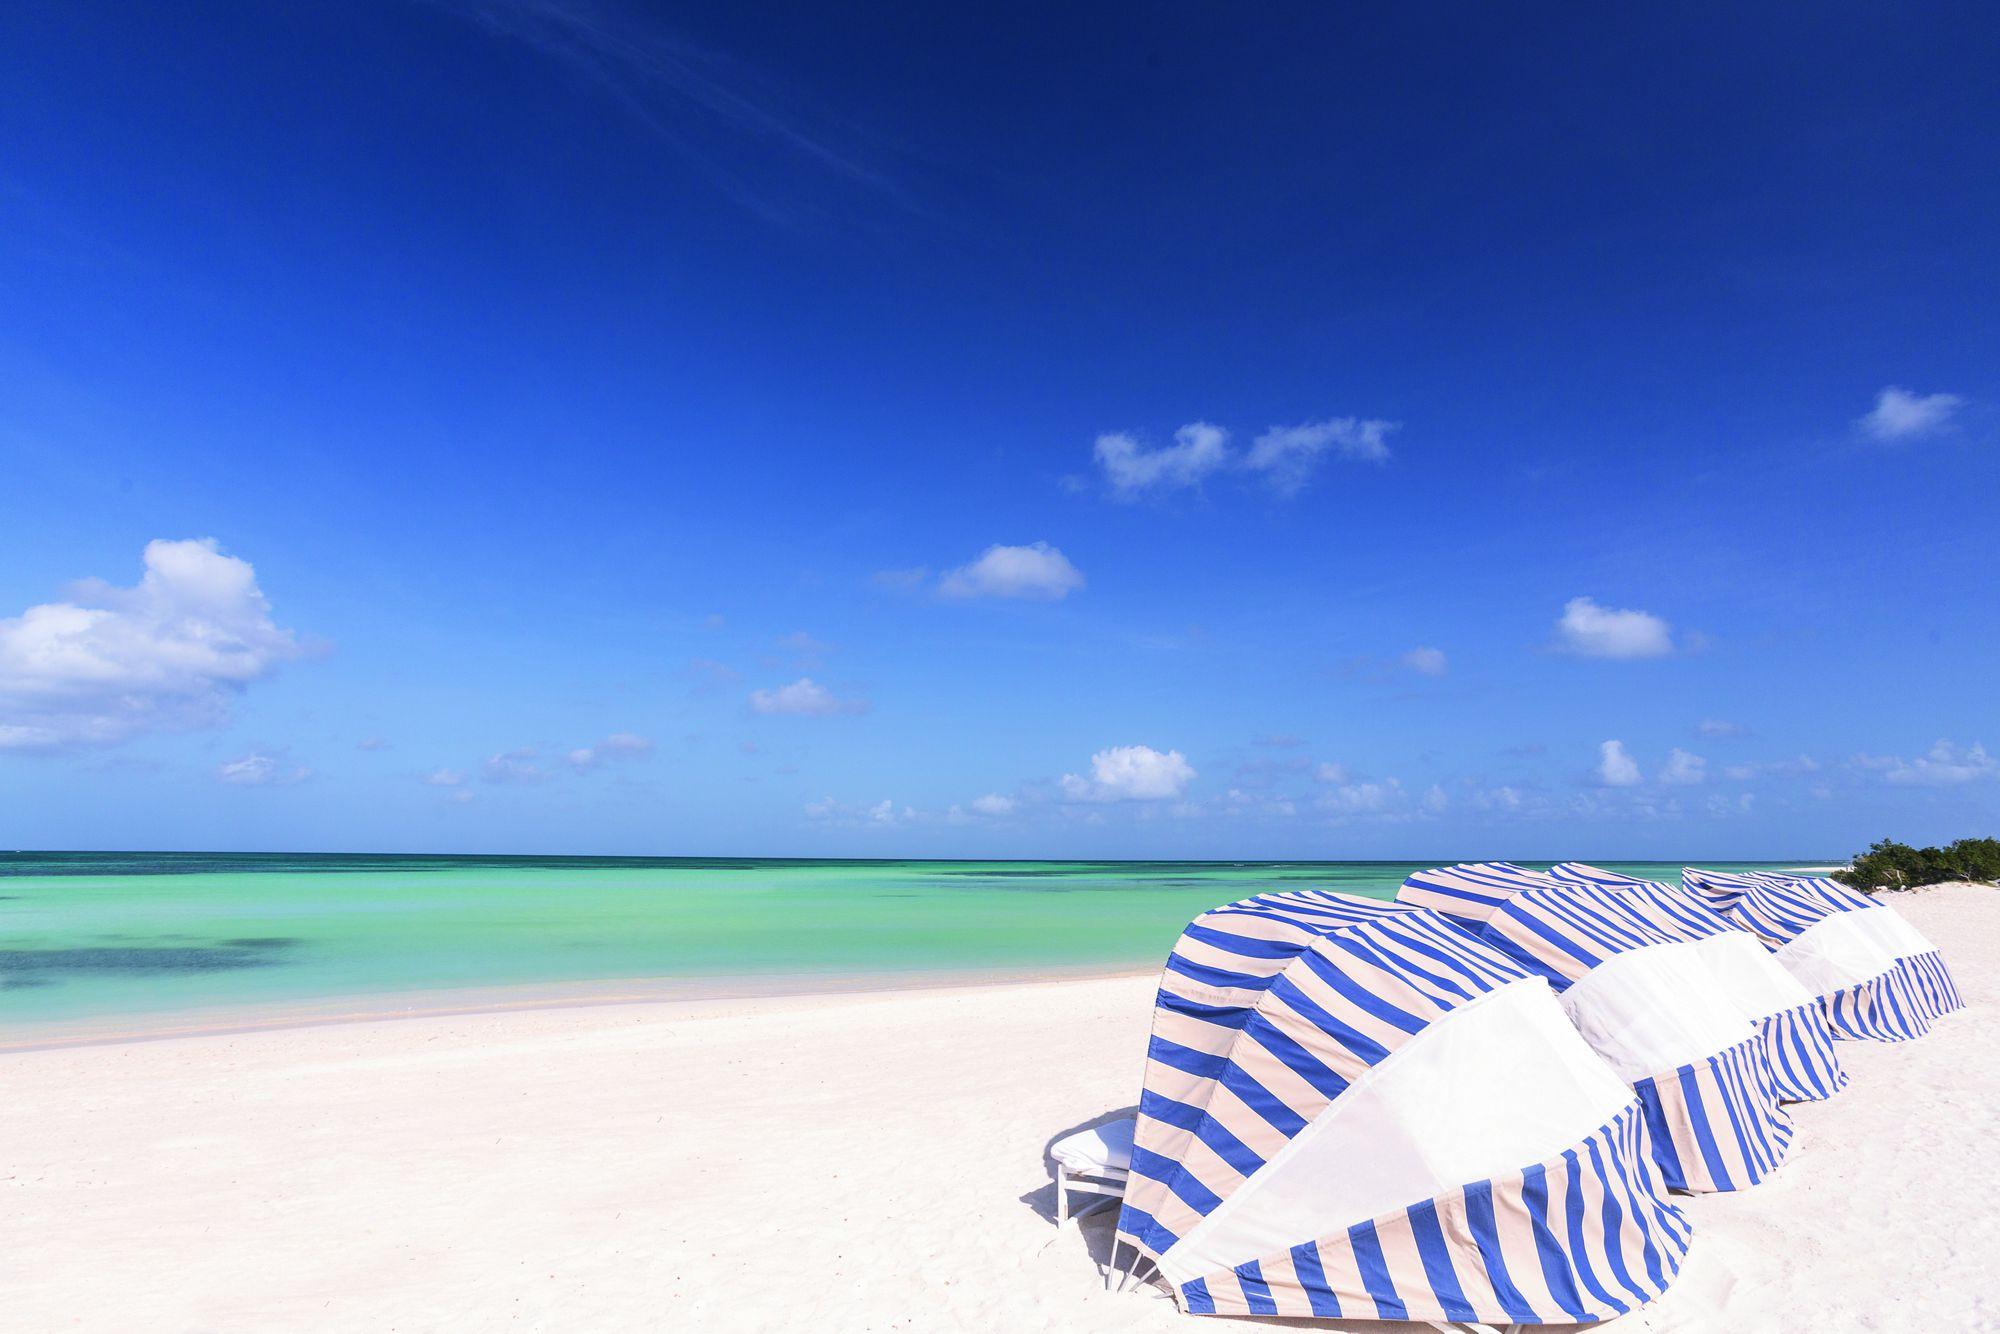 Beach_Cabanas.jpg